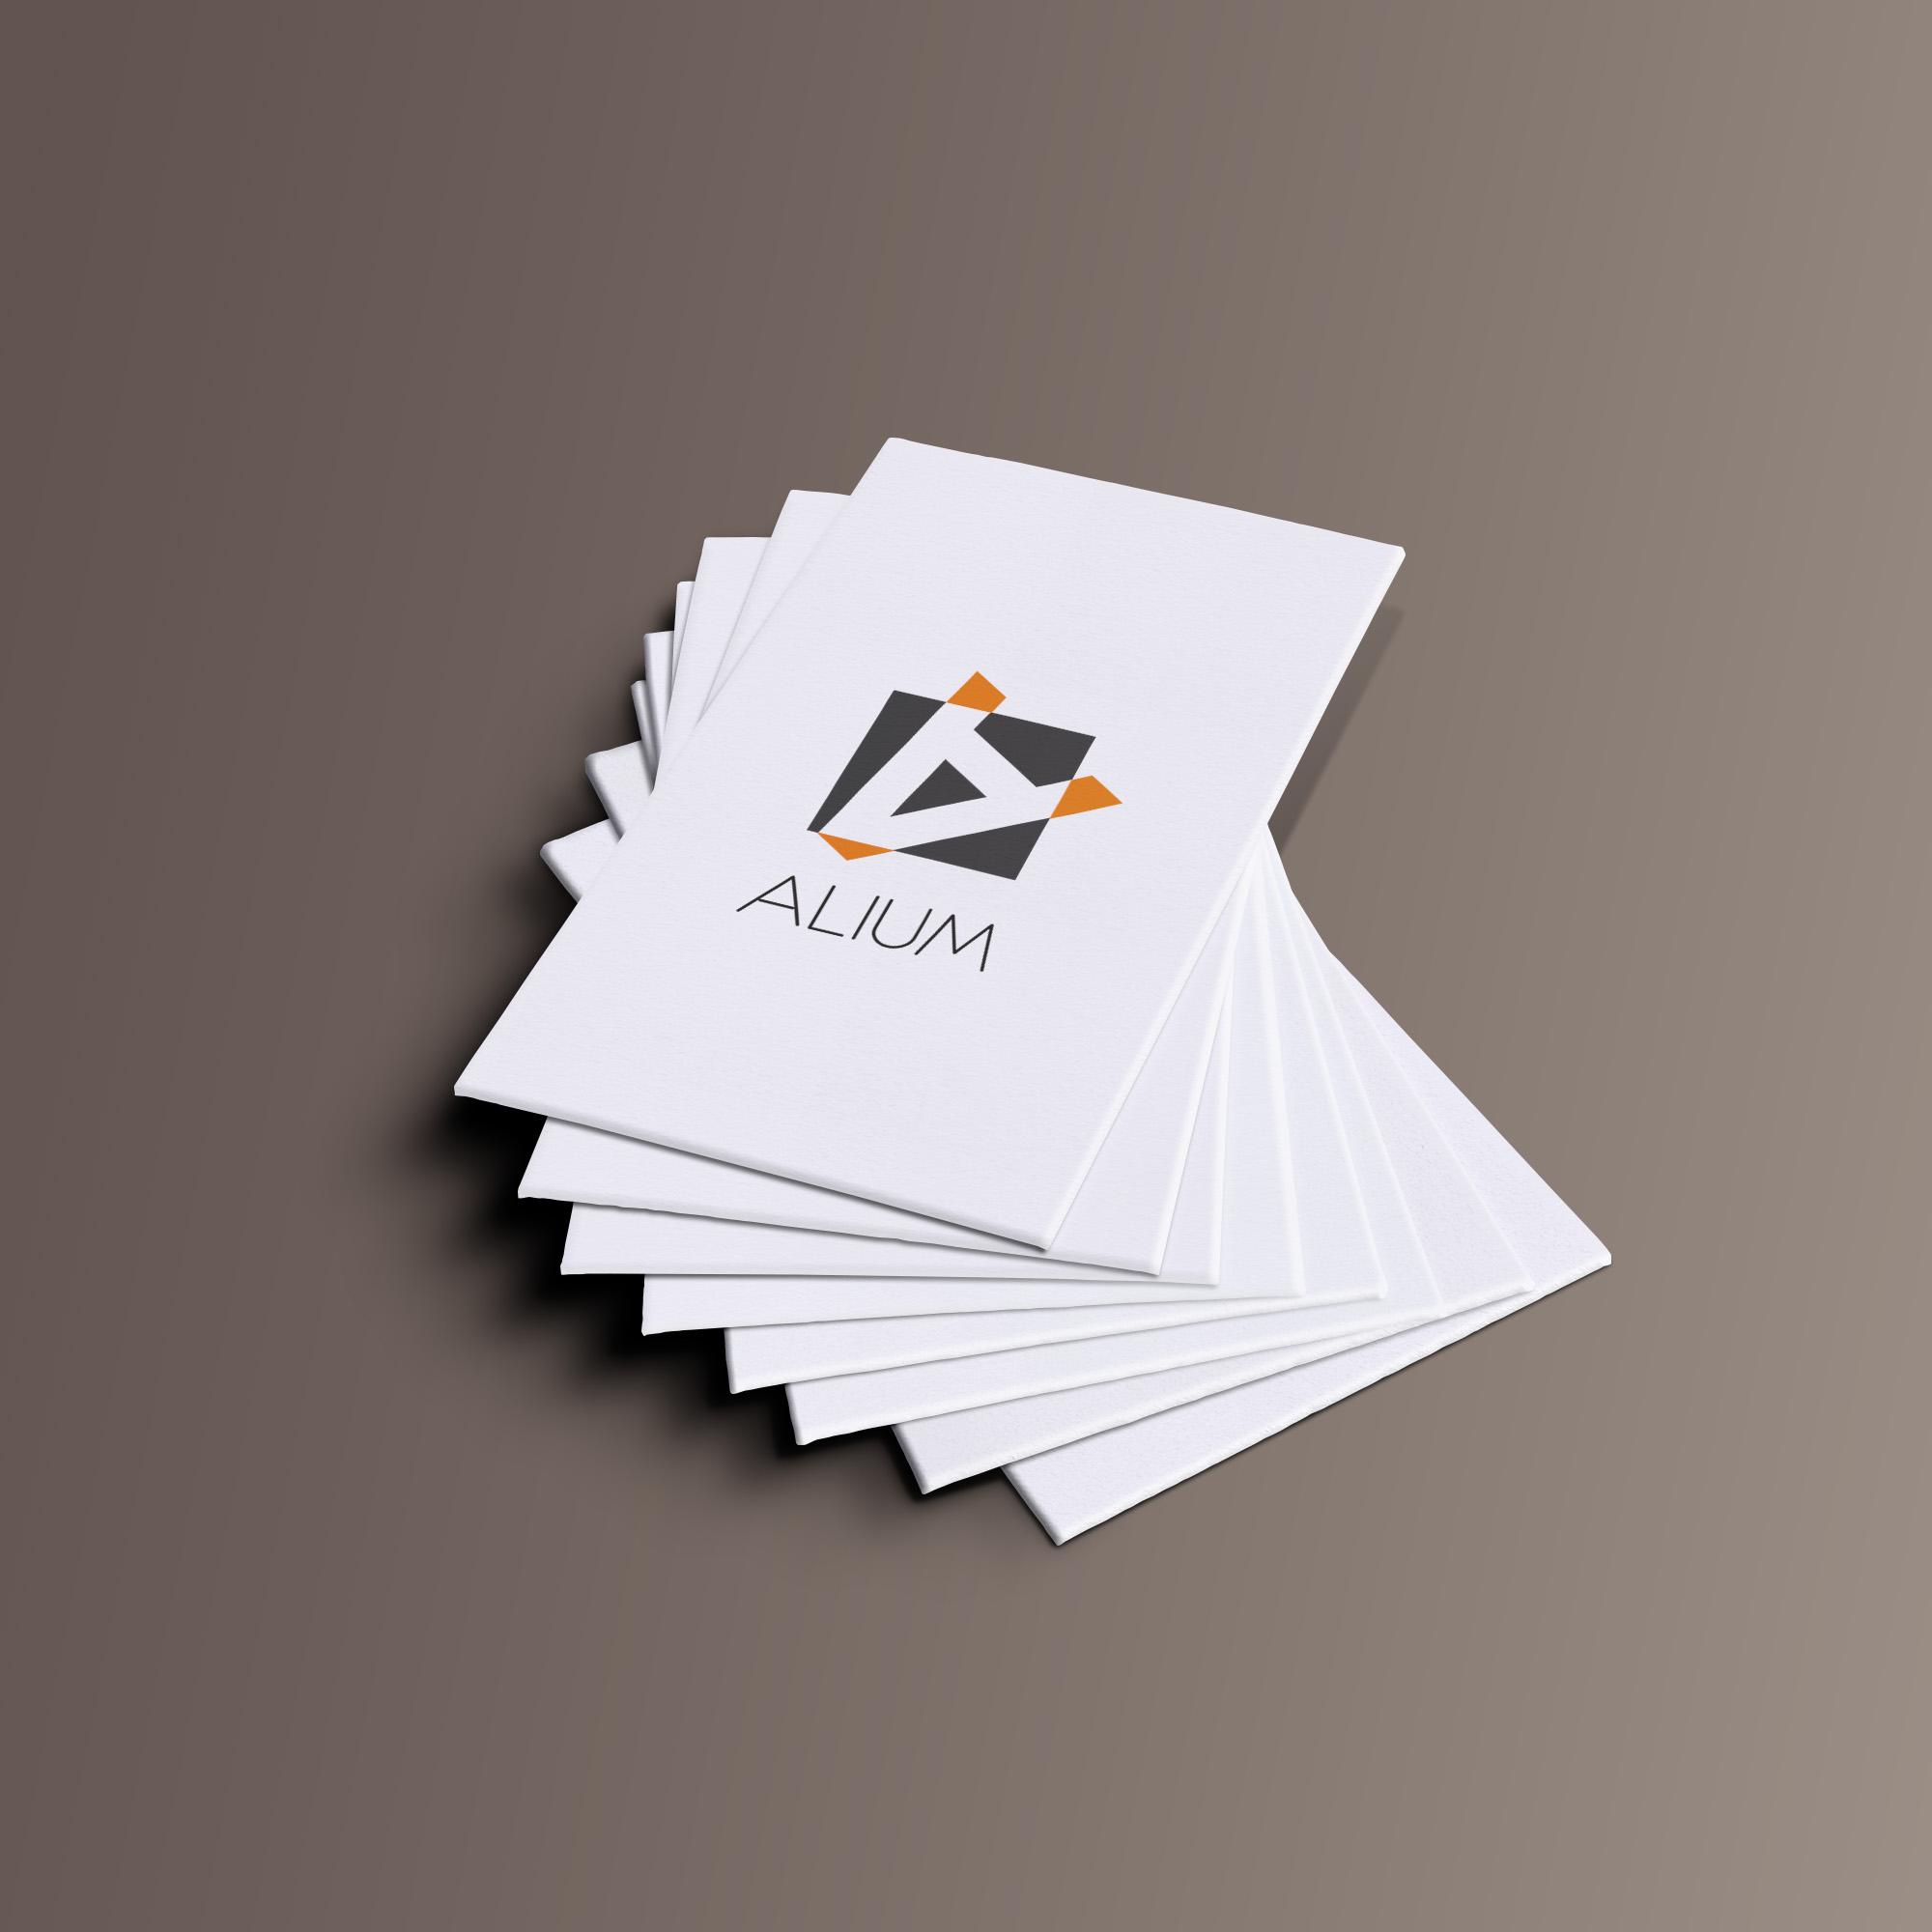 Логотип для дизайн студии фото f_56359e345969199d.jpg